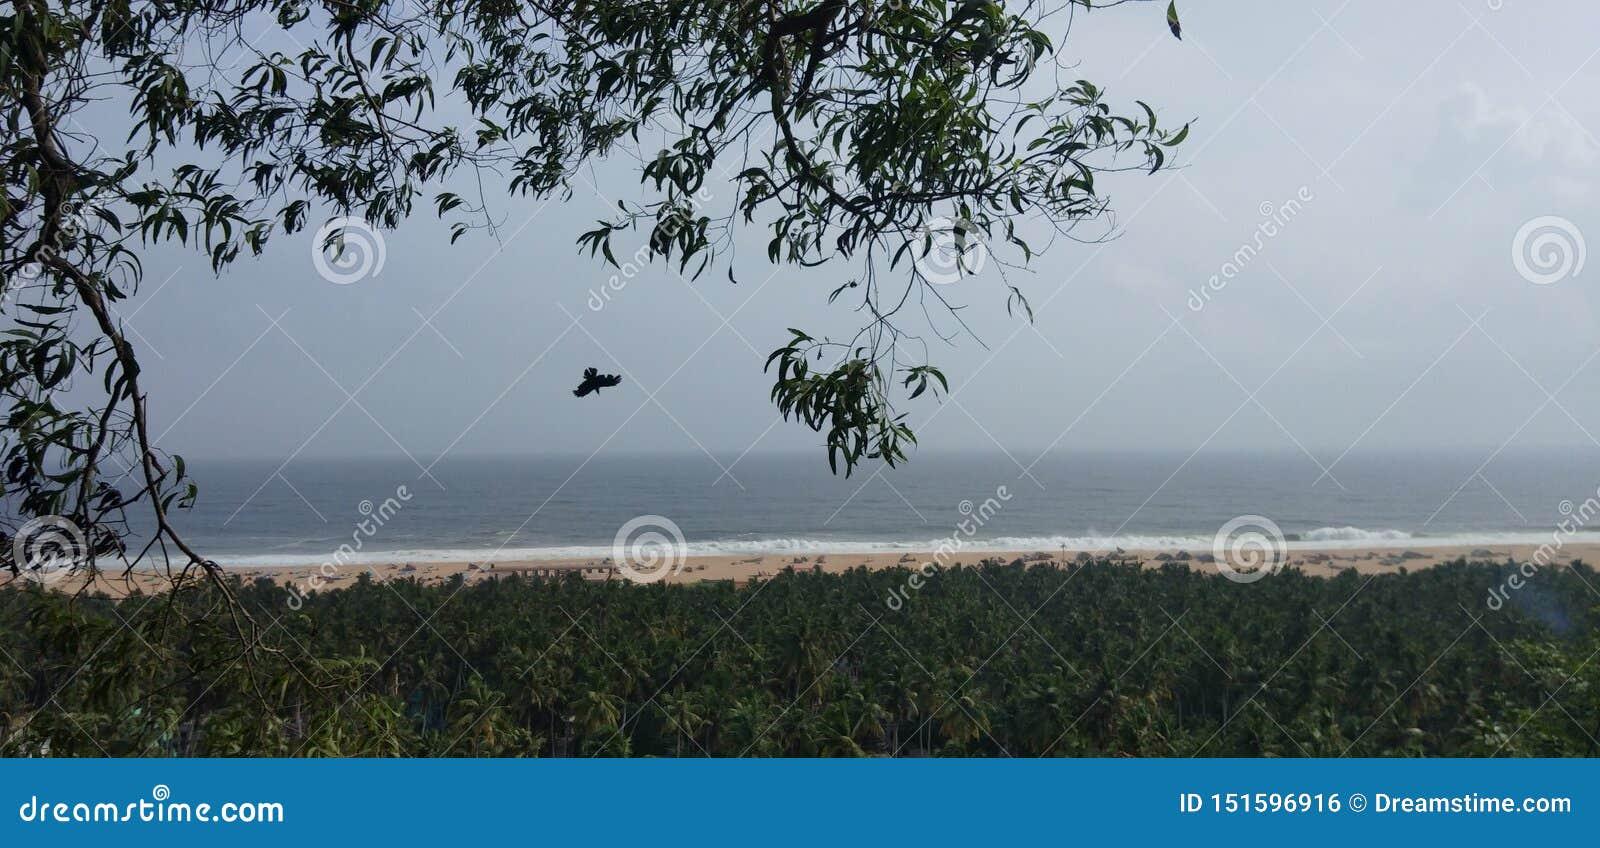 Aigle trivandrum de sable de vagues de mer de falaise